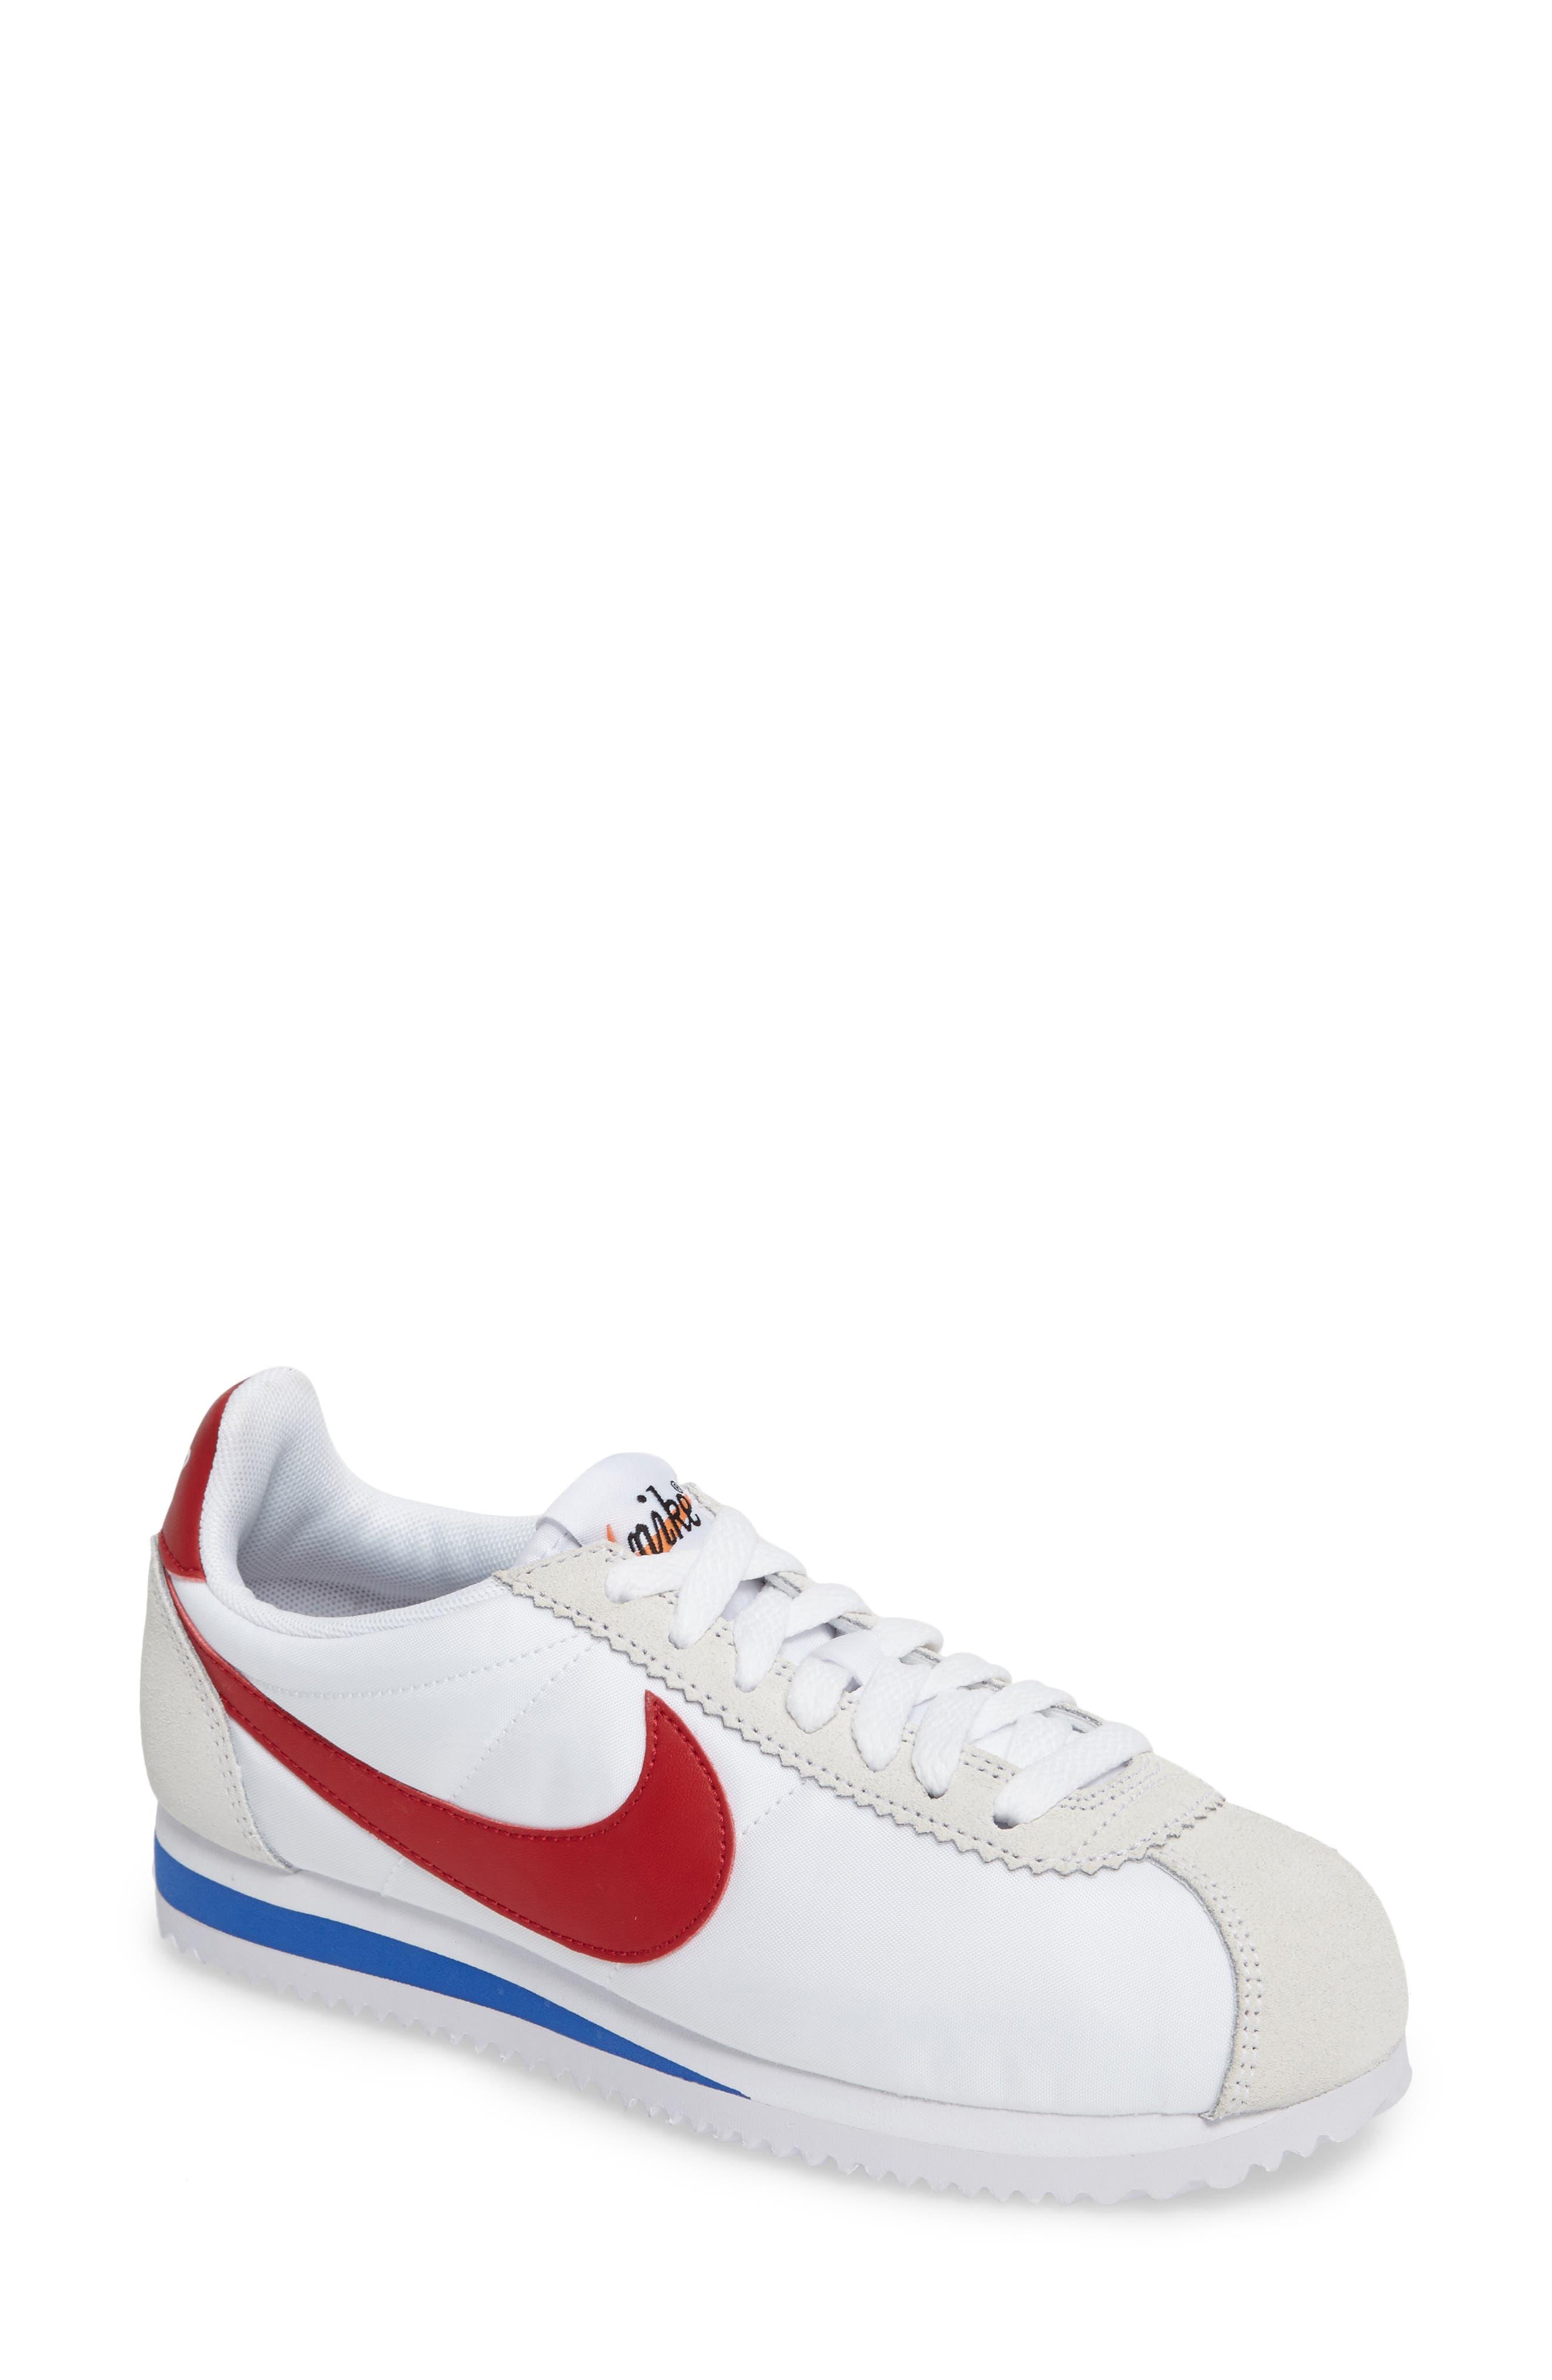 Alternate Image 1 Selected - Nike Classic Cortez Premium Sneaker (Women)